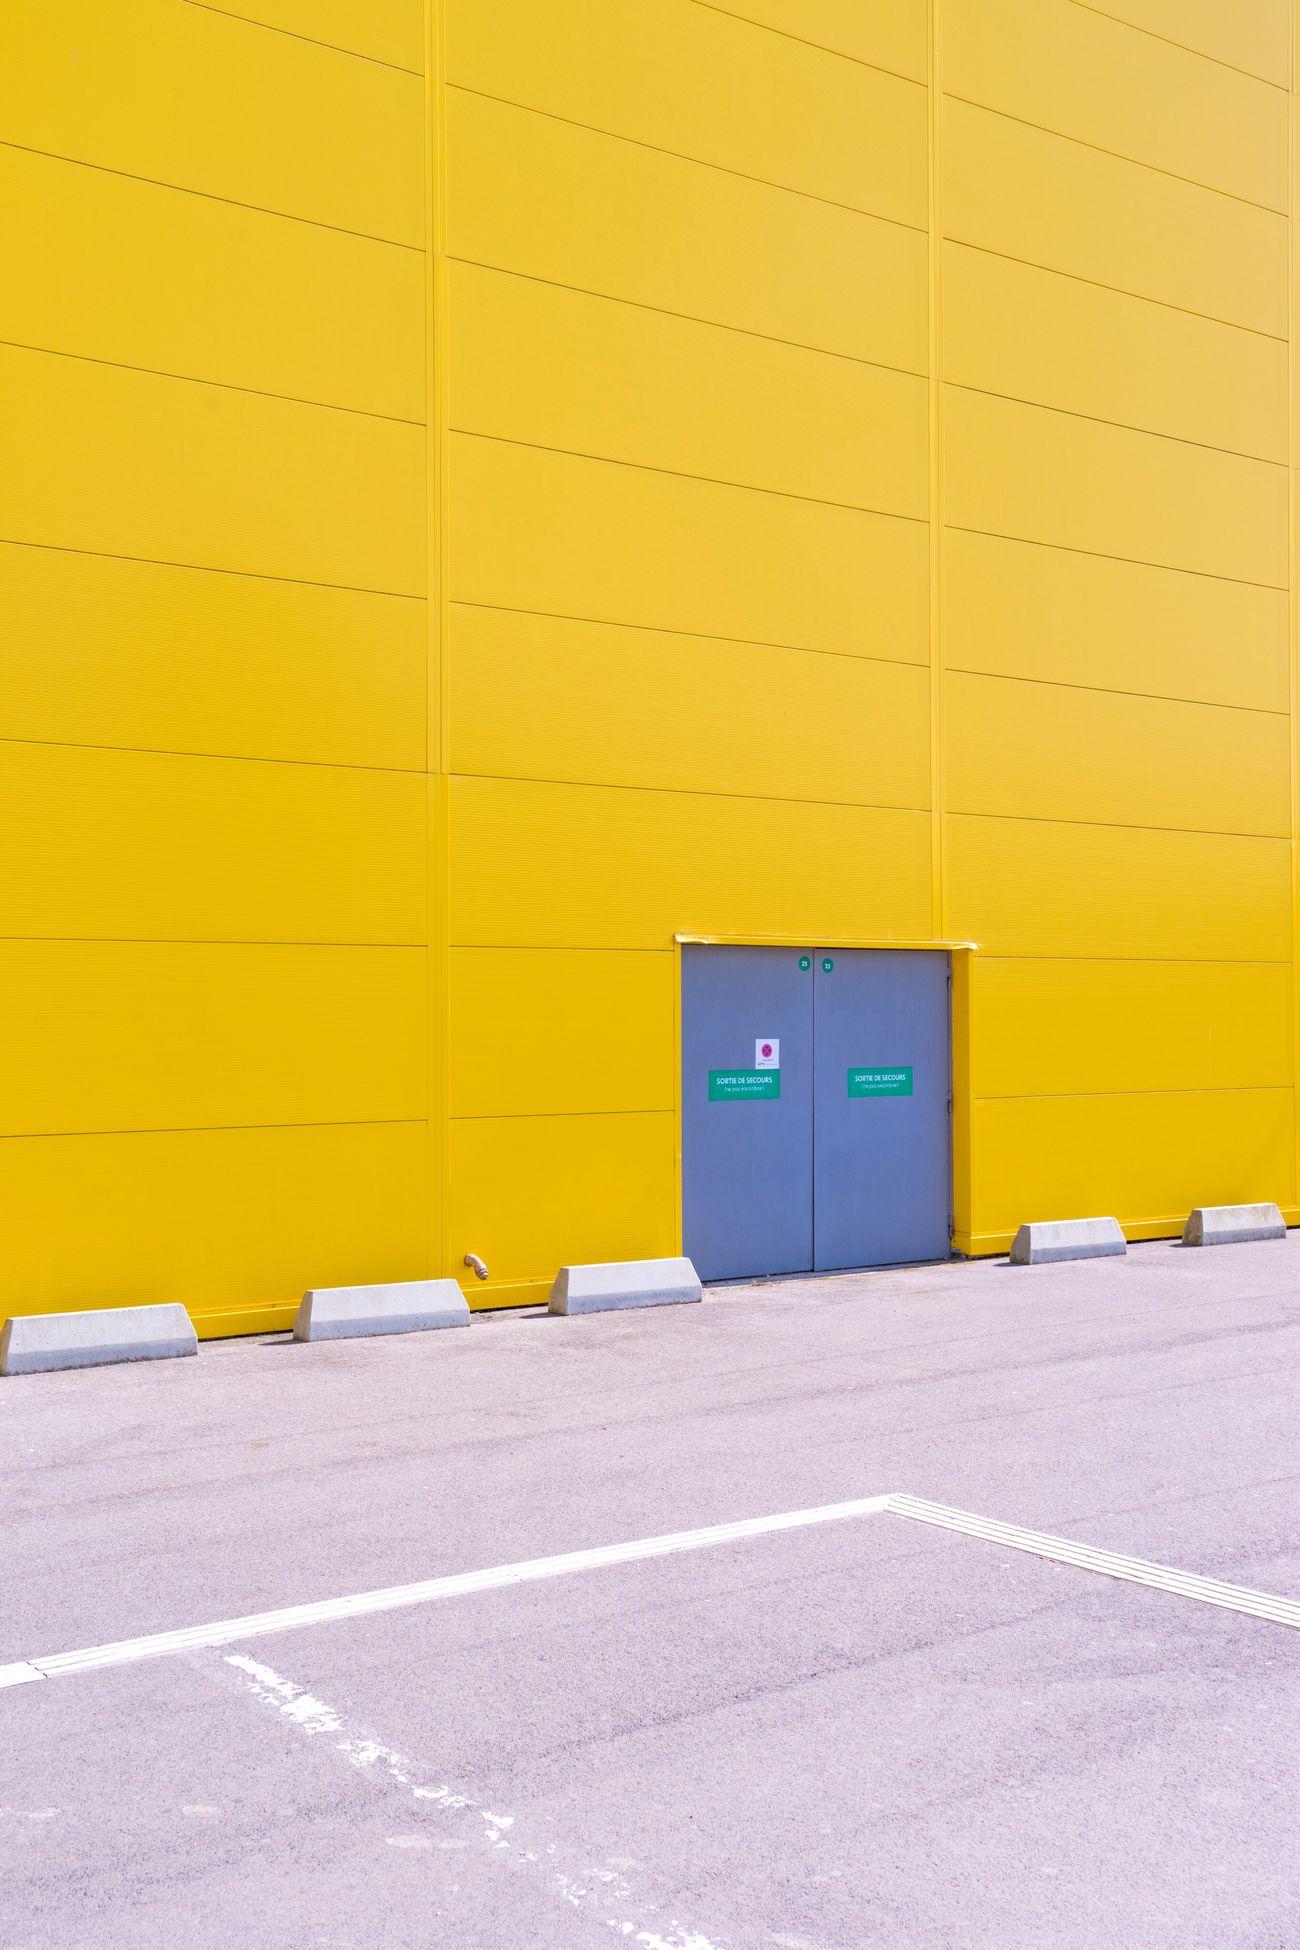 Yellow Built Structure Warehouse The Architect - 2017 EyeEm Awards Architectural Detail Lines And Shapes EyeEm Best Shots EyeEm Best Edits TheWeekOnEyeEM EyeEmBestPics Subjectivelyobjective Façade IKEA Montpellier Odysseum Yellow Color Door Parking